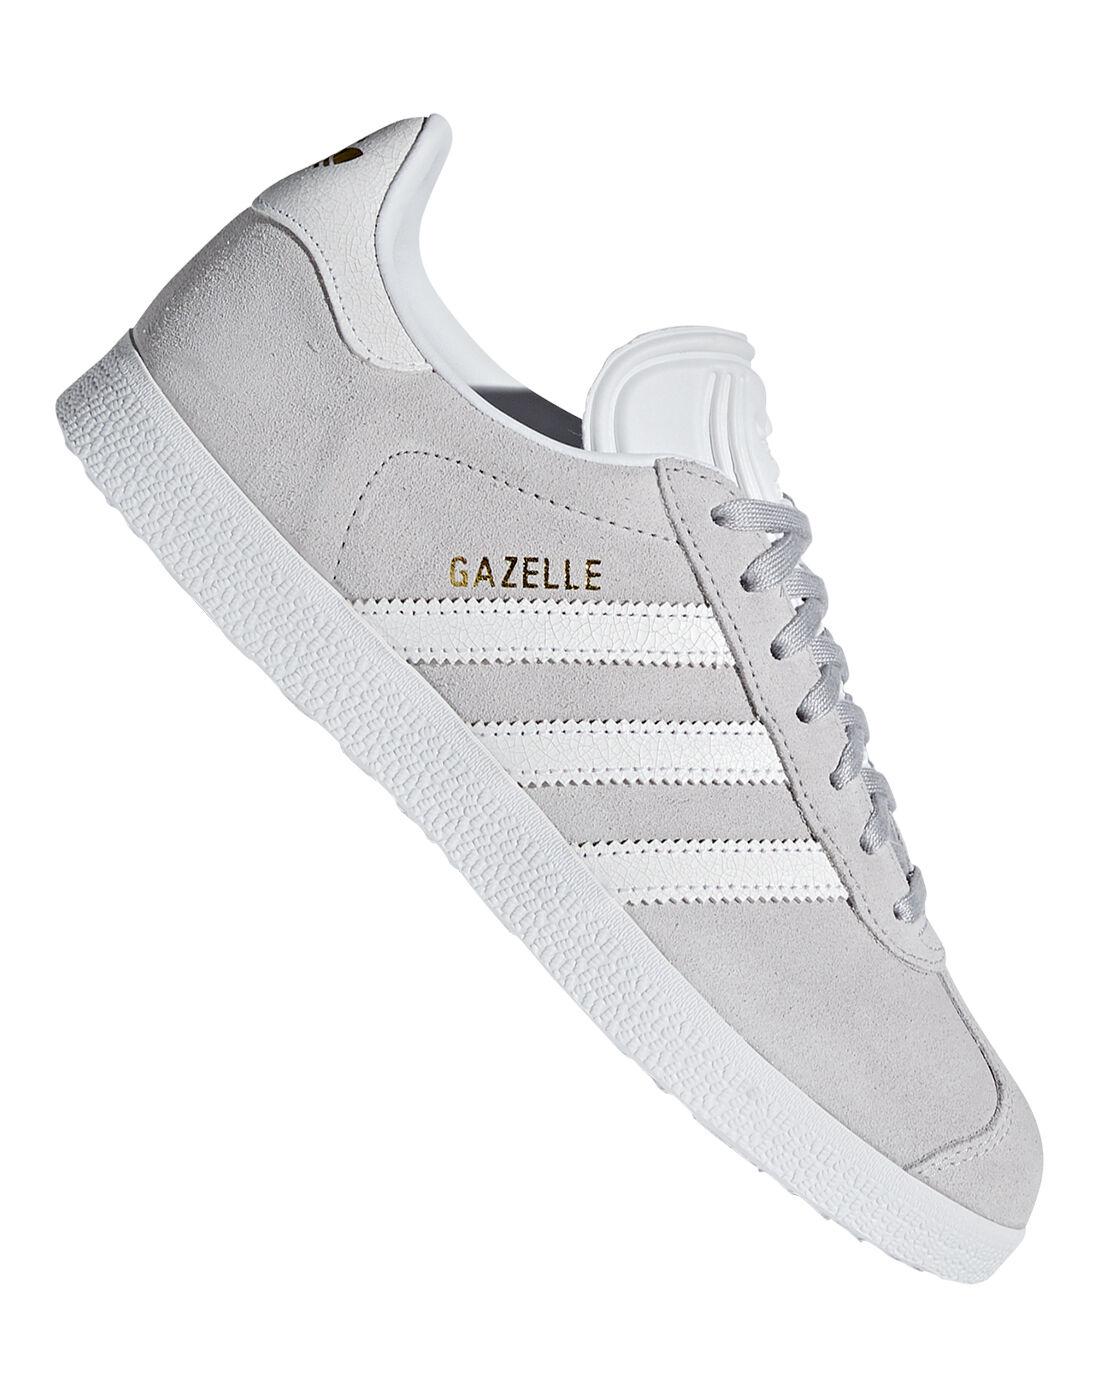 adidas gazelle womens ireland